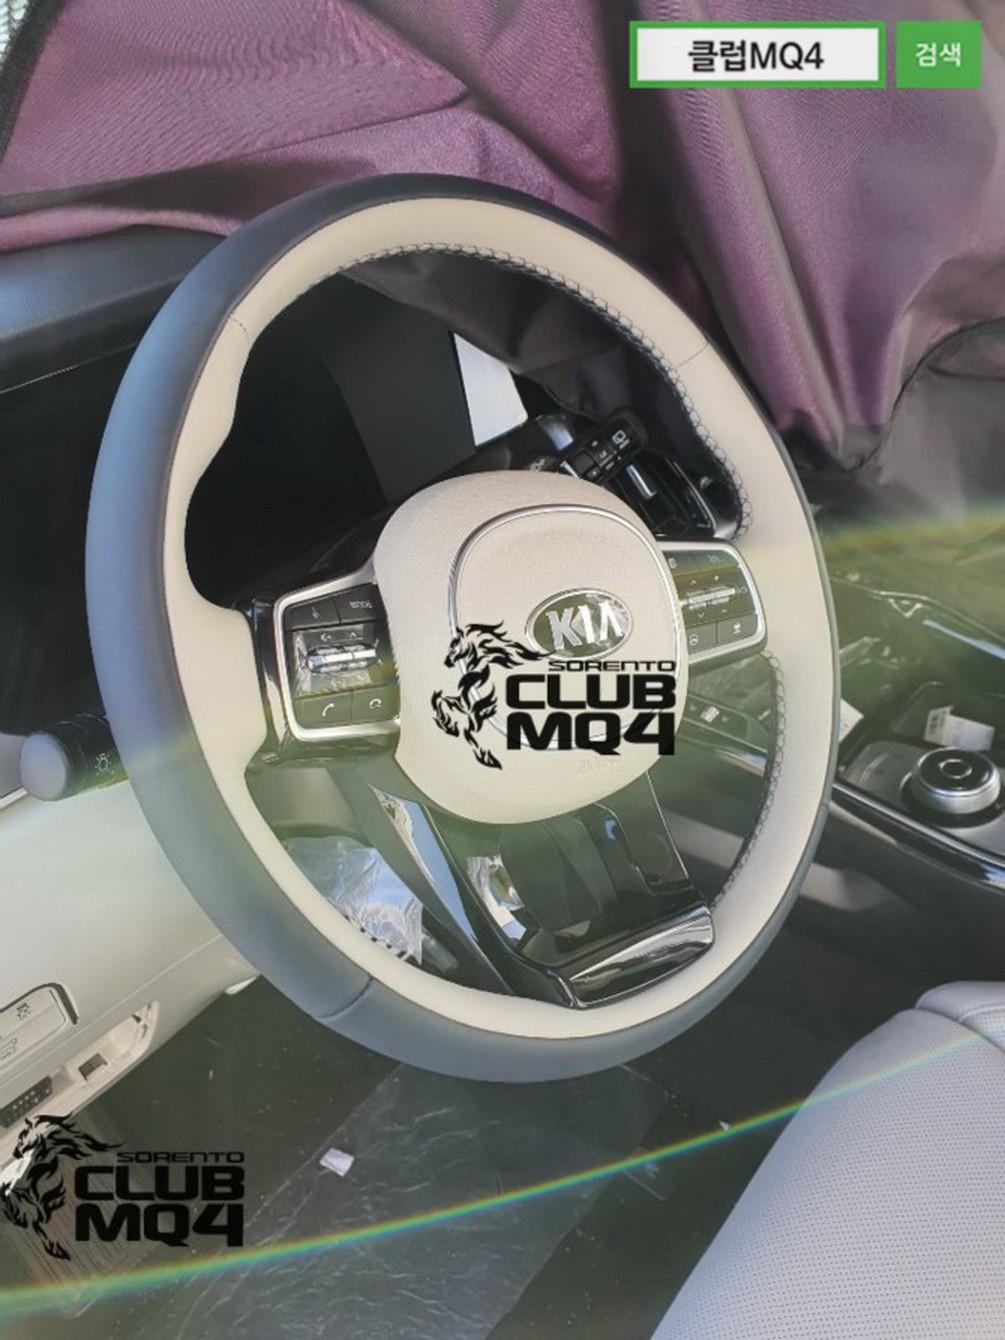 Black Kia Soul >> 2021 Kia Sorento MQ4 Spotted Undisguised, Interior Has ...